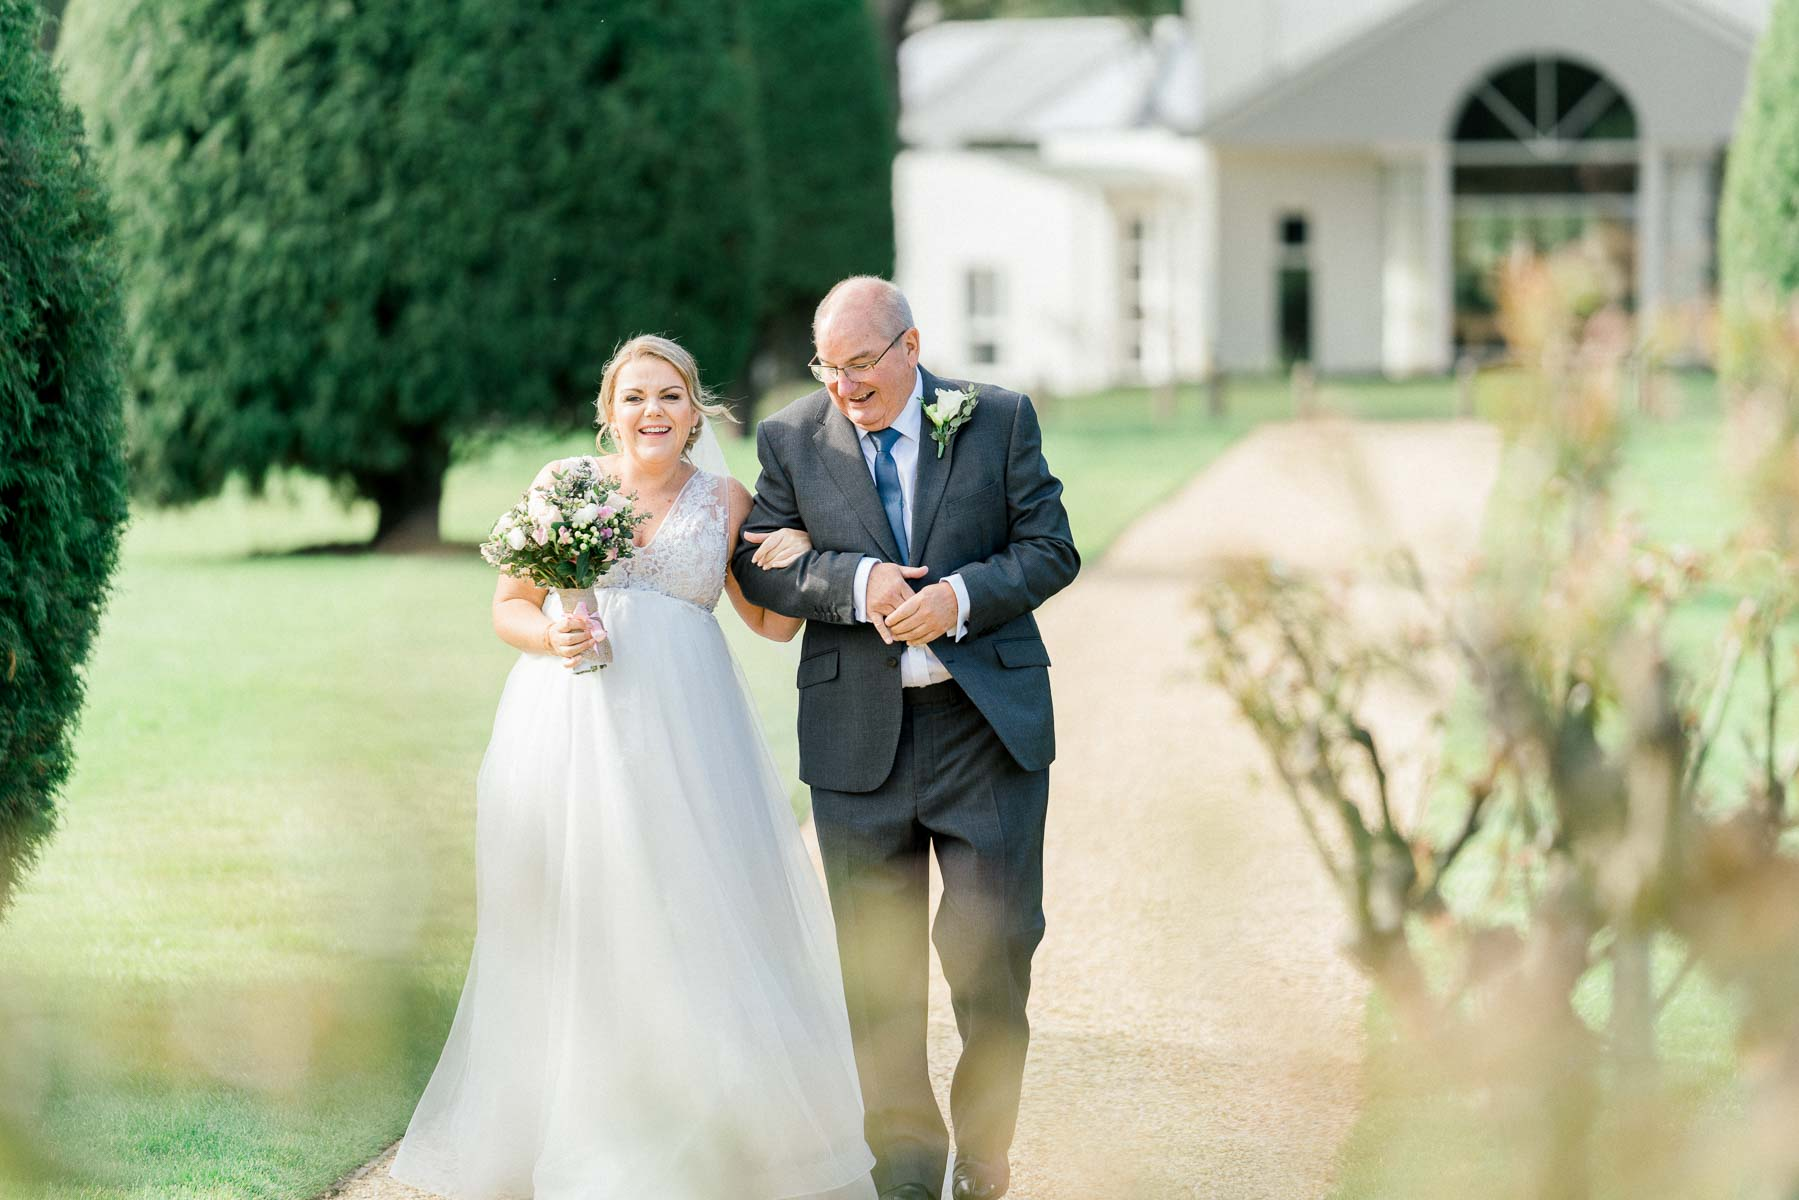 lindenderry-wedding-heart+soul-weddings-amy-alain-03203.jpg